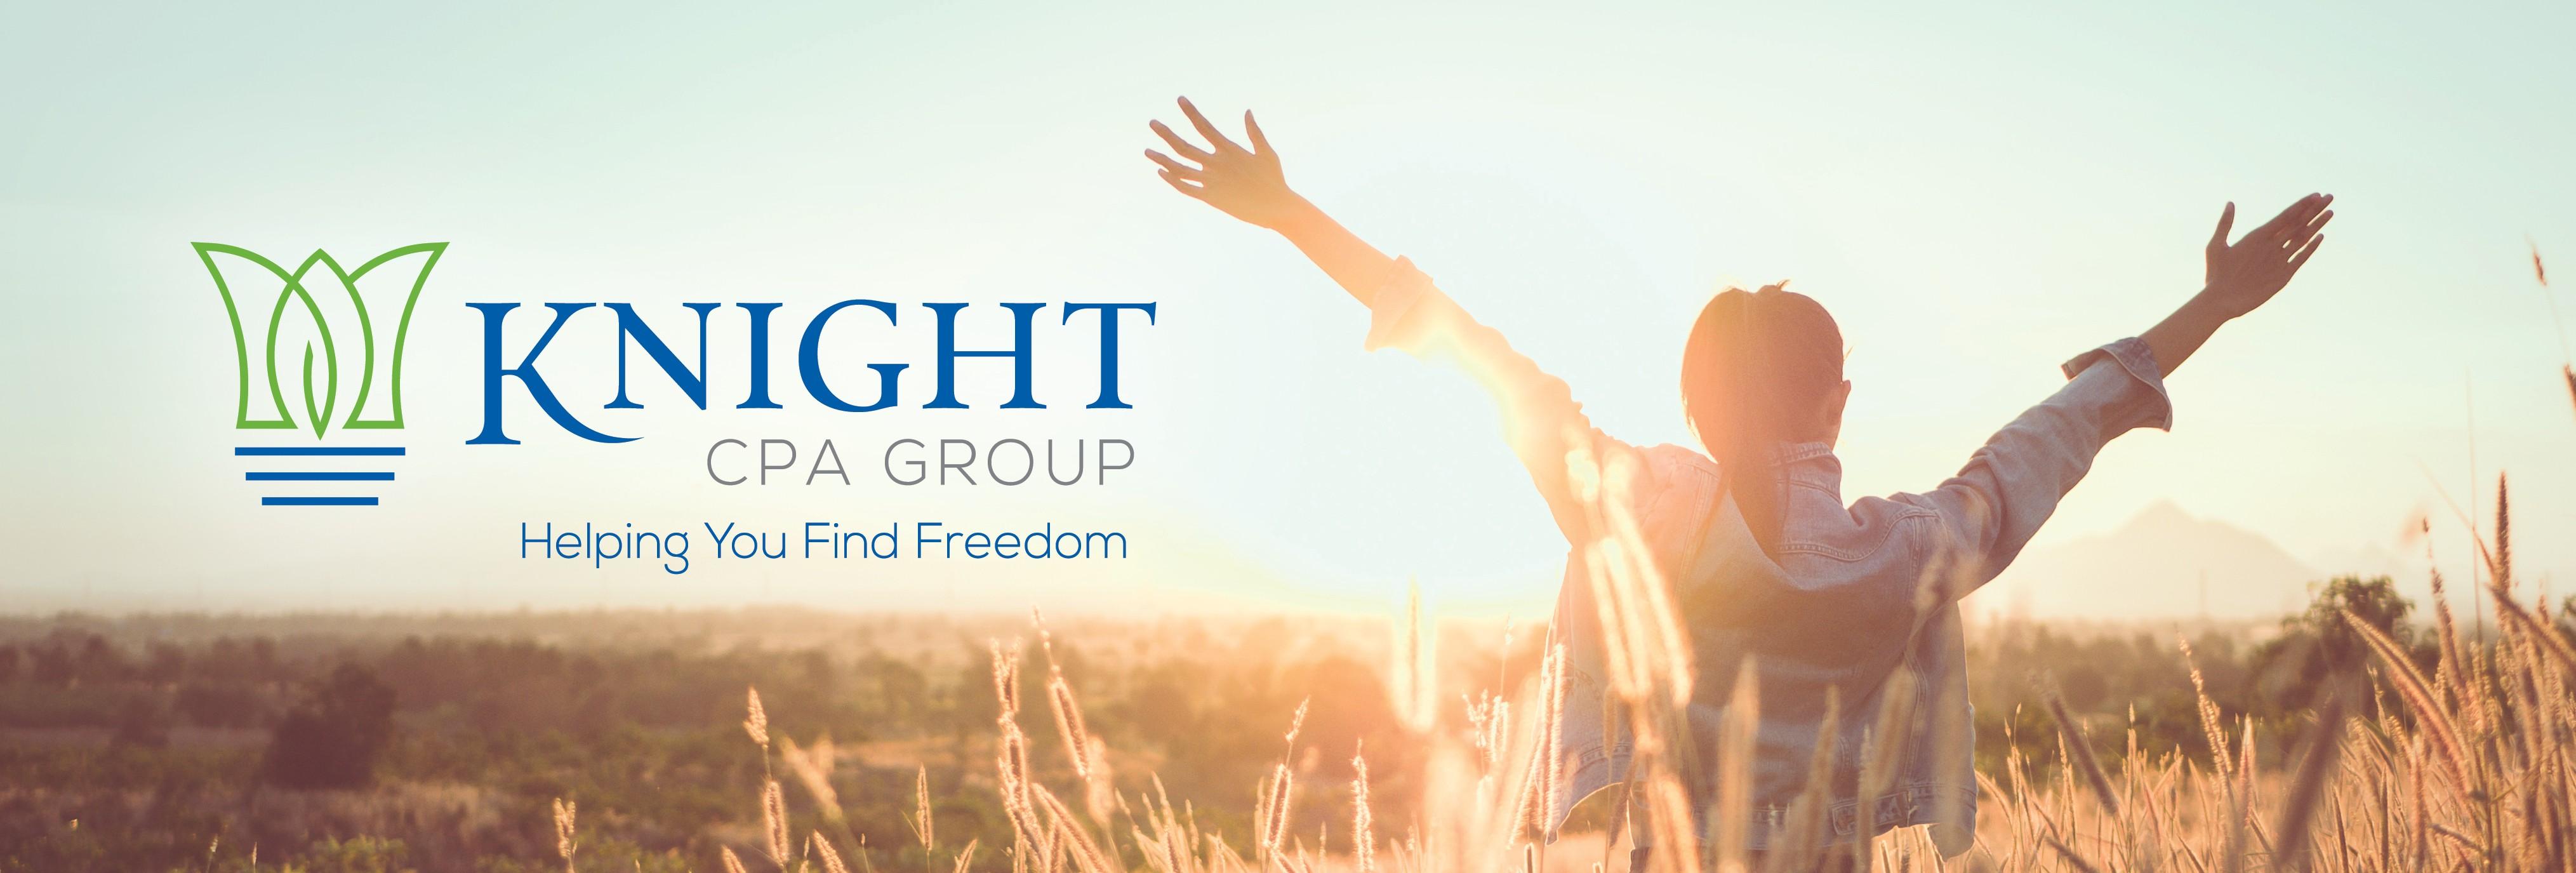 Knight CPA Group   LinkedIn